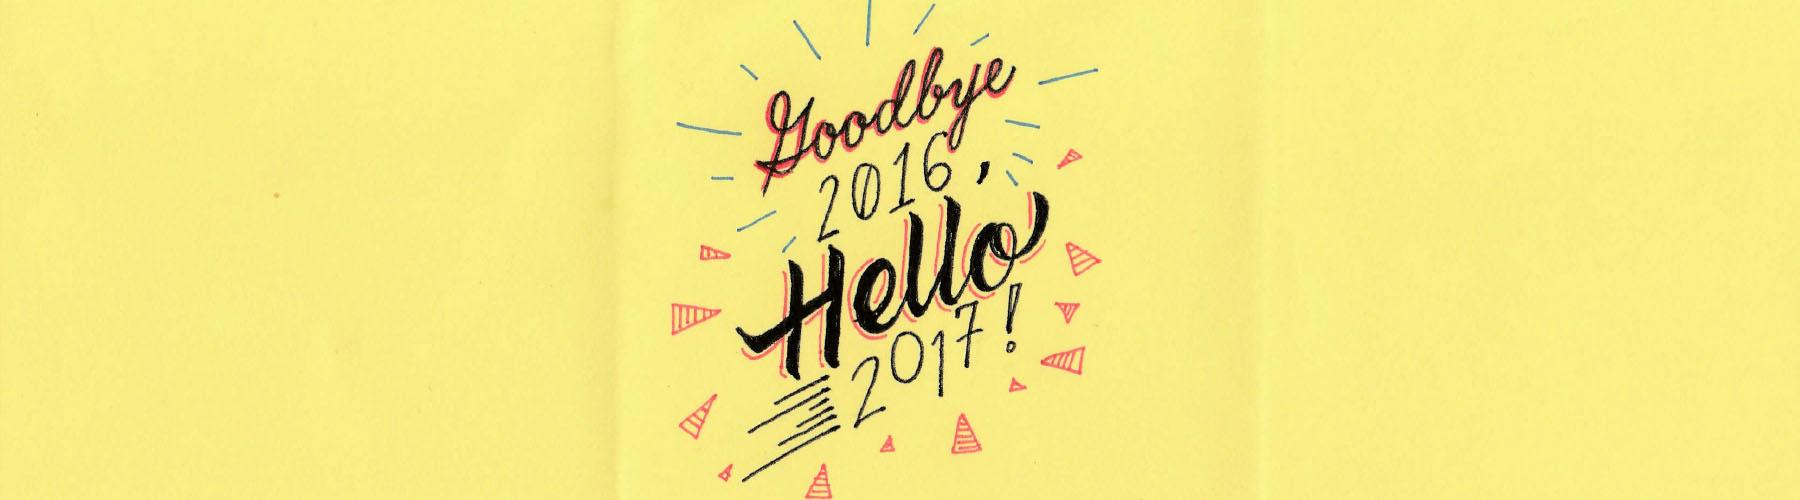 Goodbye-2016-Hello-2017Artboard-1.jpg